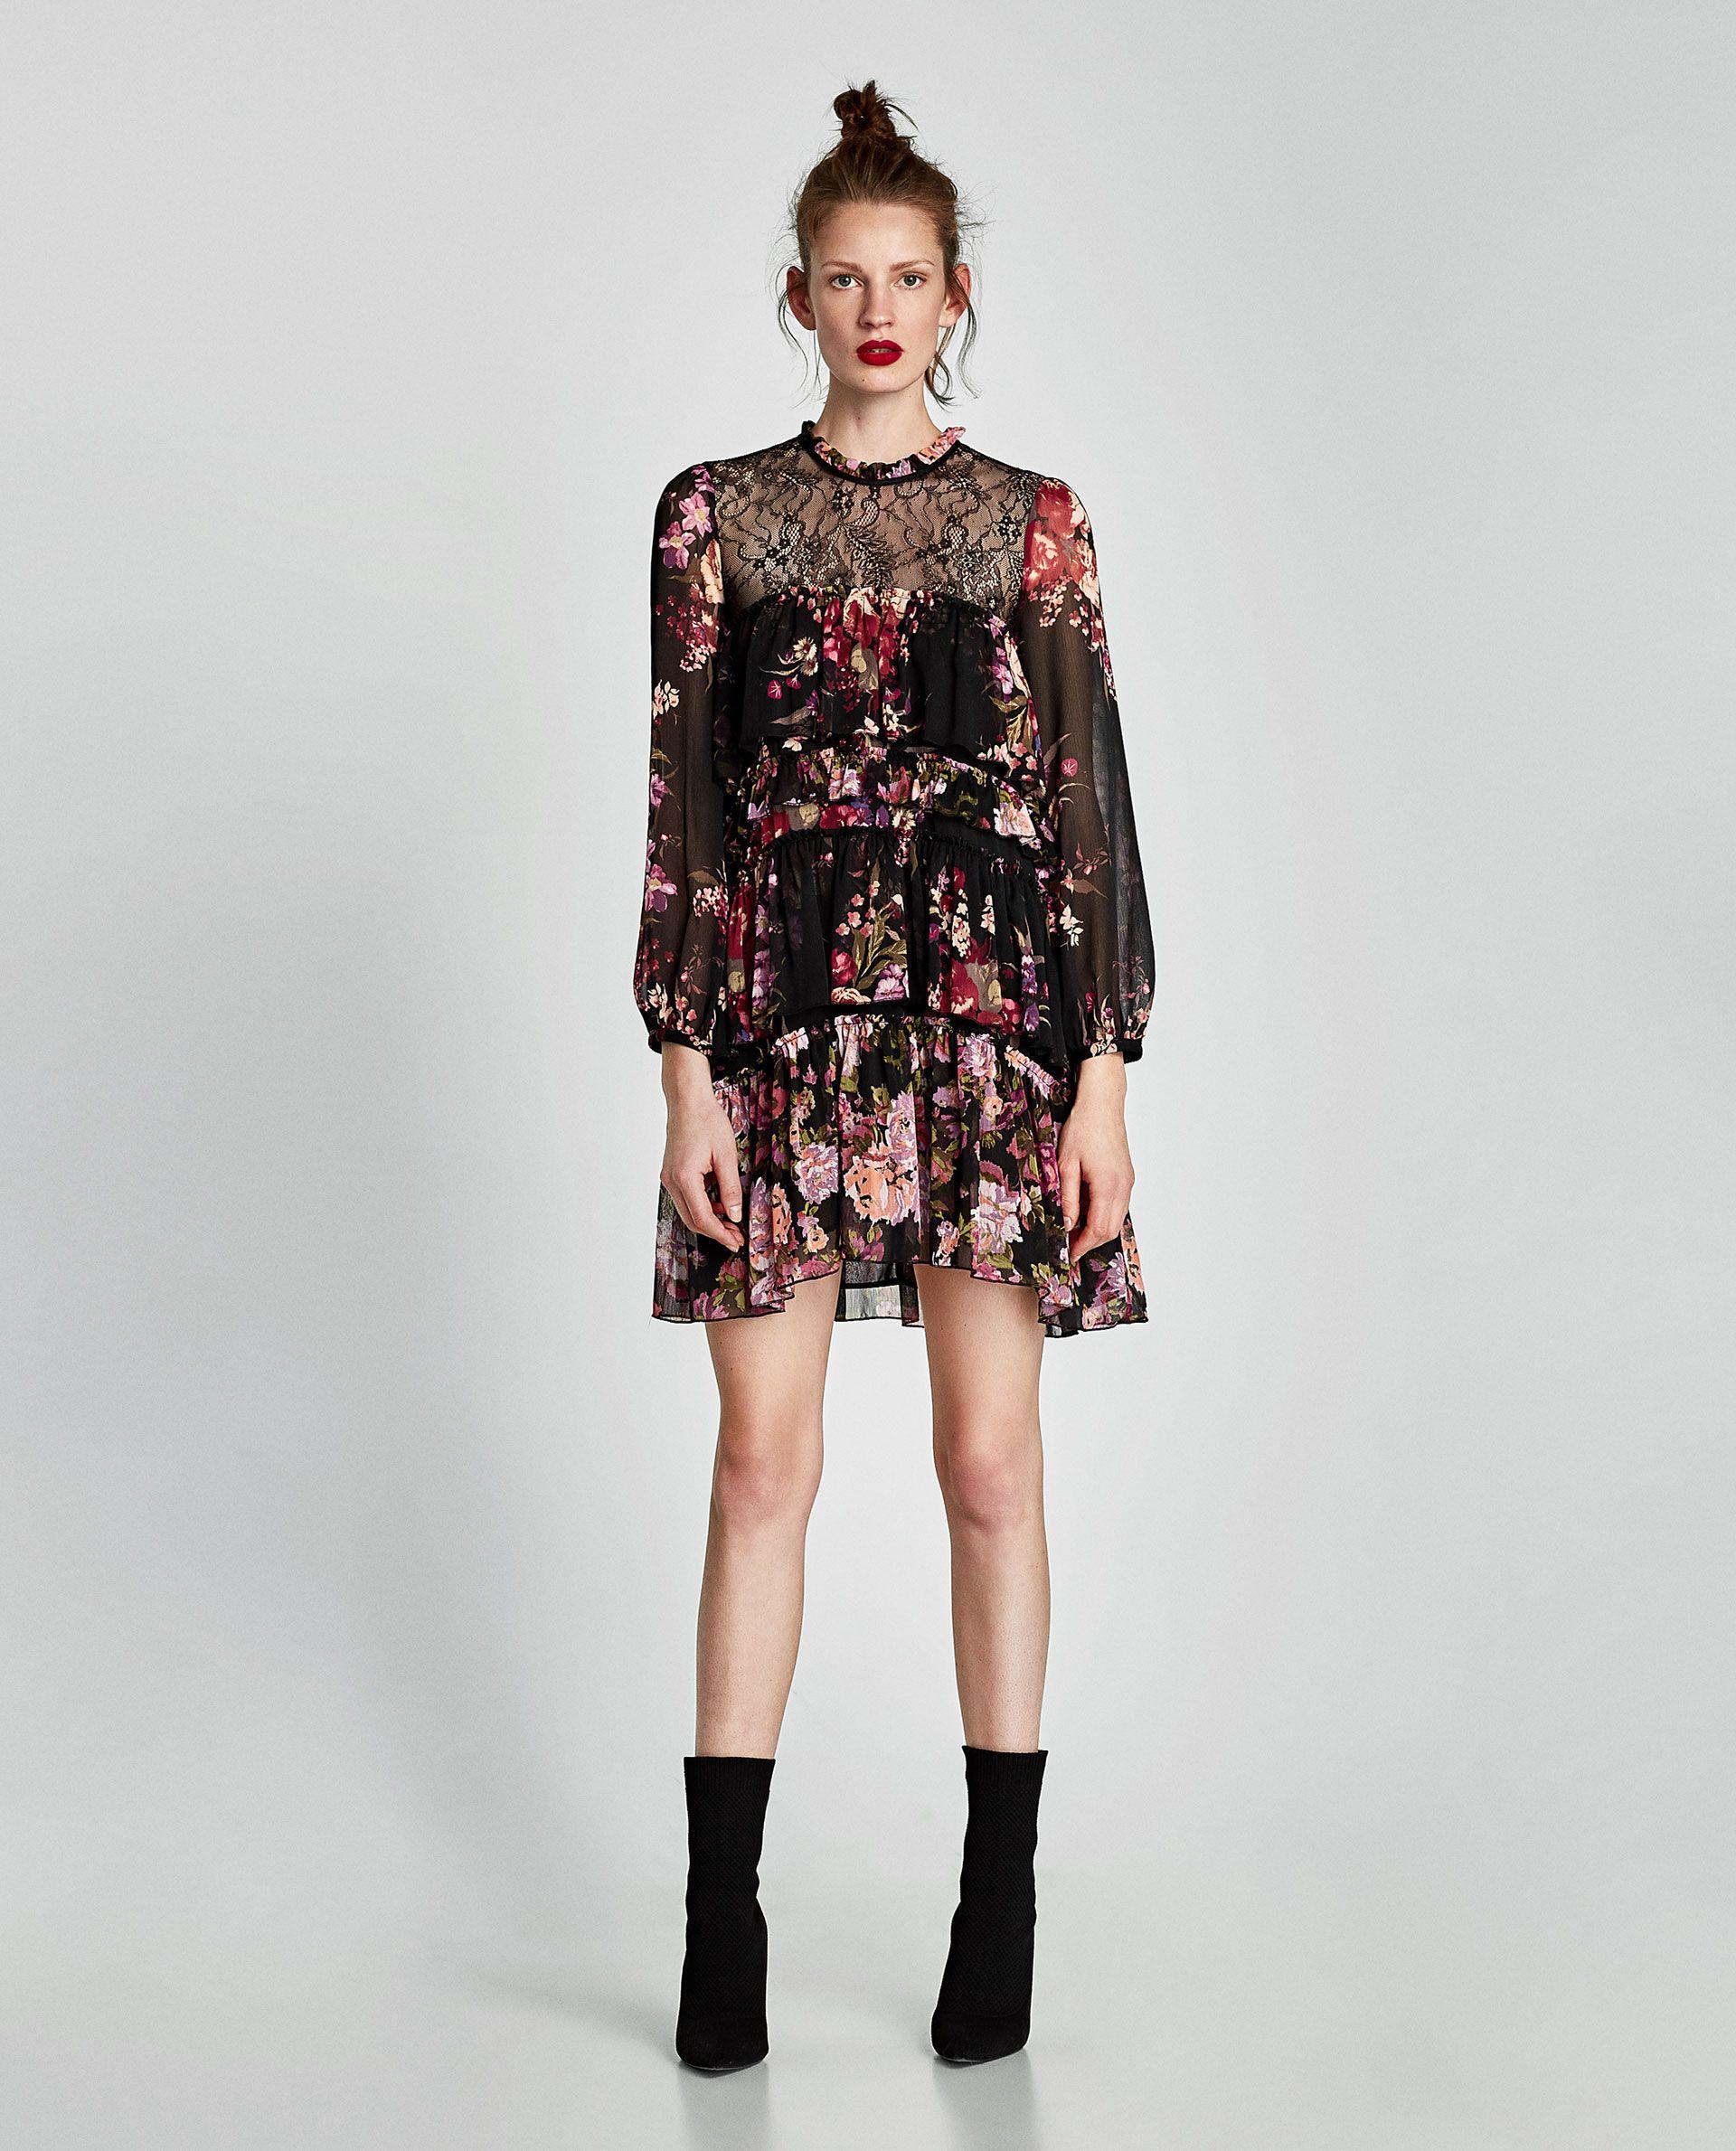 fde5f37f ZARA - WOMAN - COMBINED LACE DRESS WITH RUFFLES | Fashion - Zara SS ...